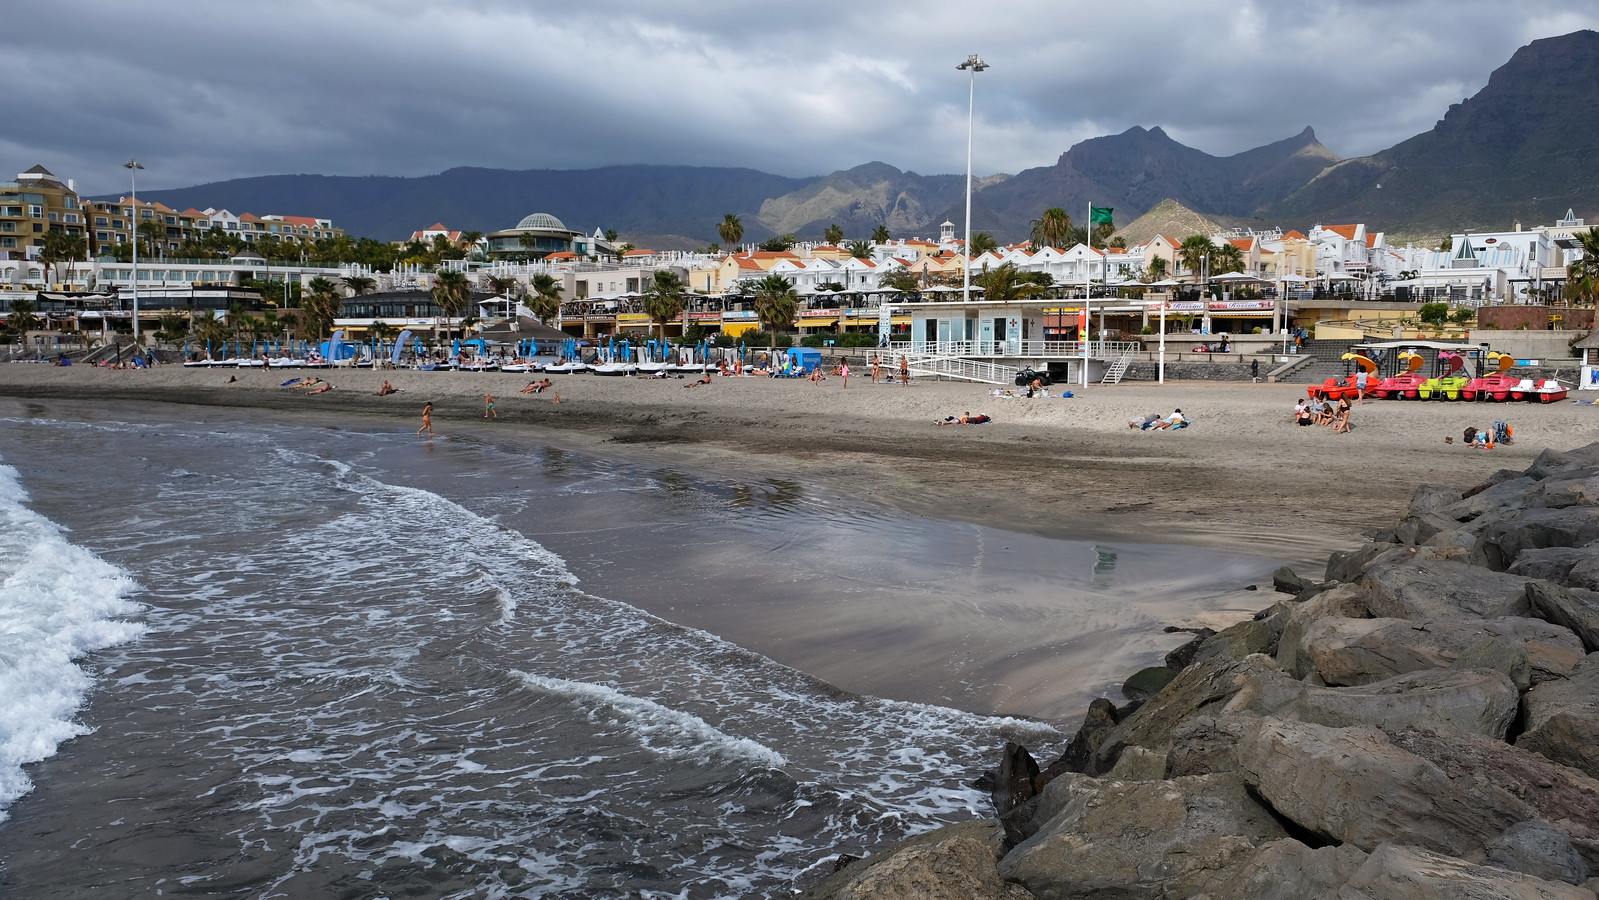 Fañabe Beach, Costa Adeje, Tenerife, Canary Islands, Spain